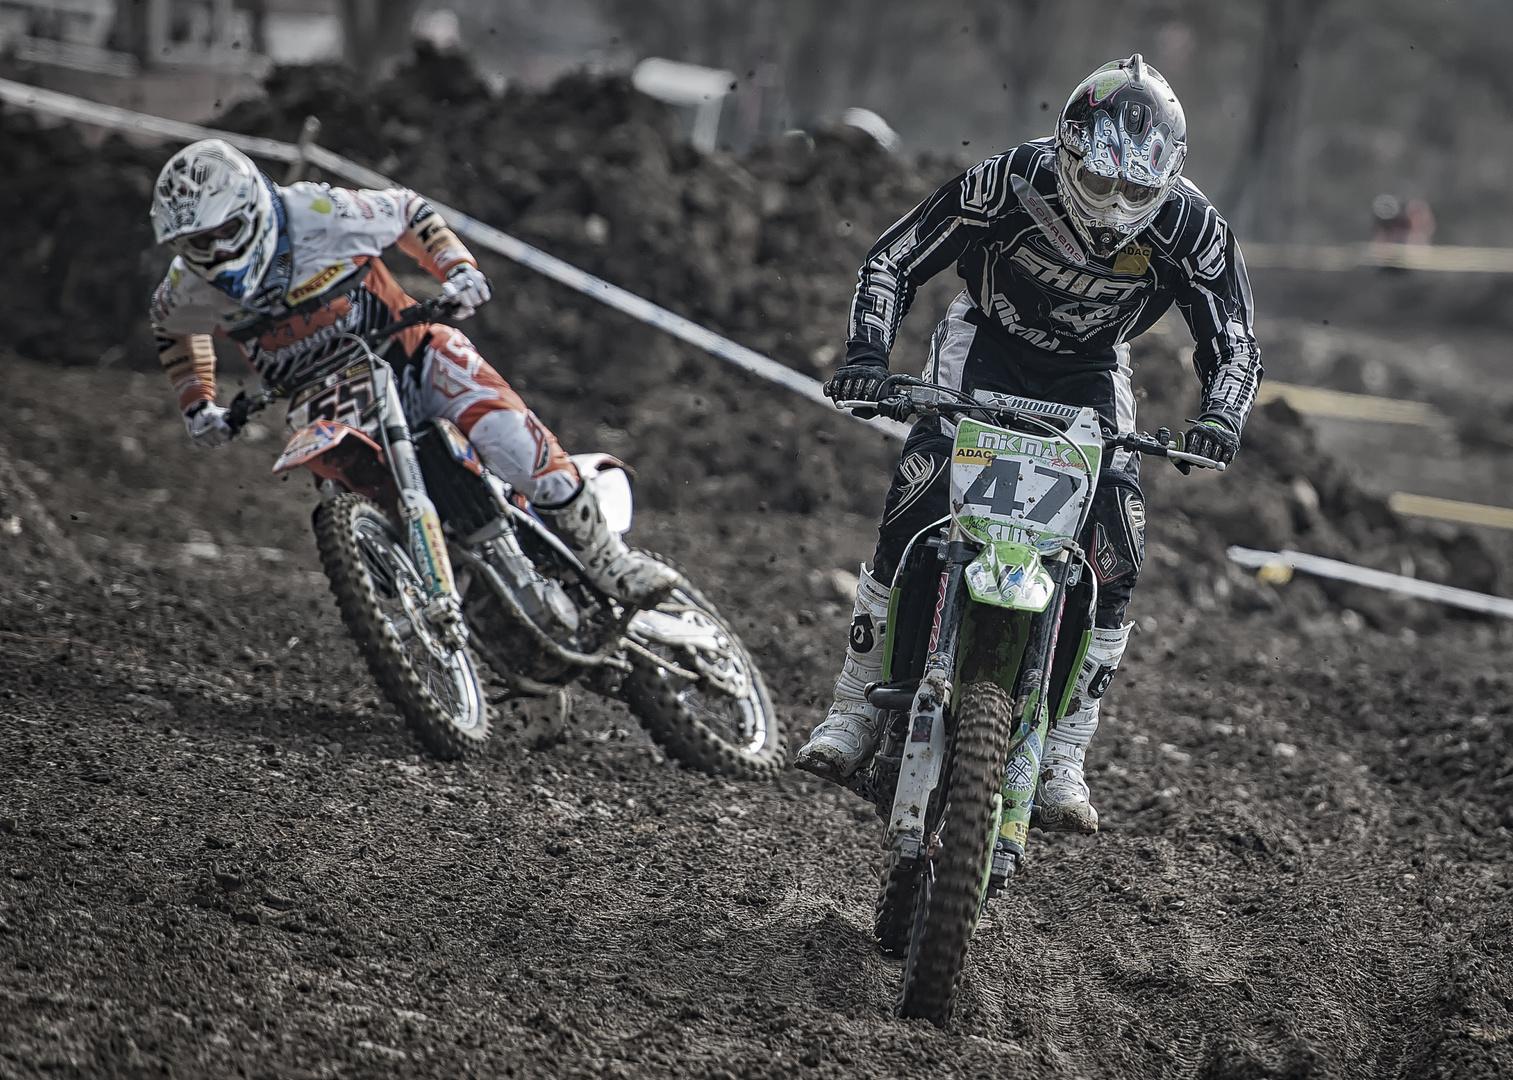 Motocross Schnaitheim 2013 - Abschlussbild